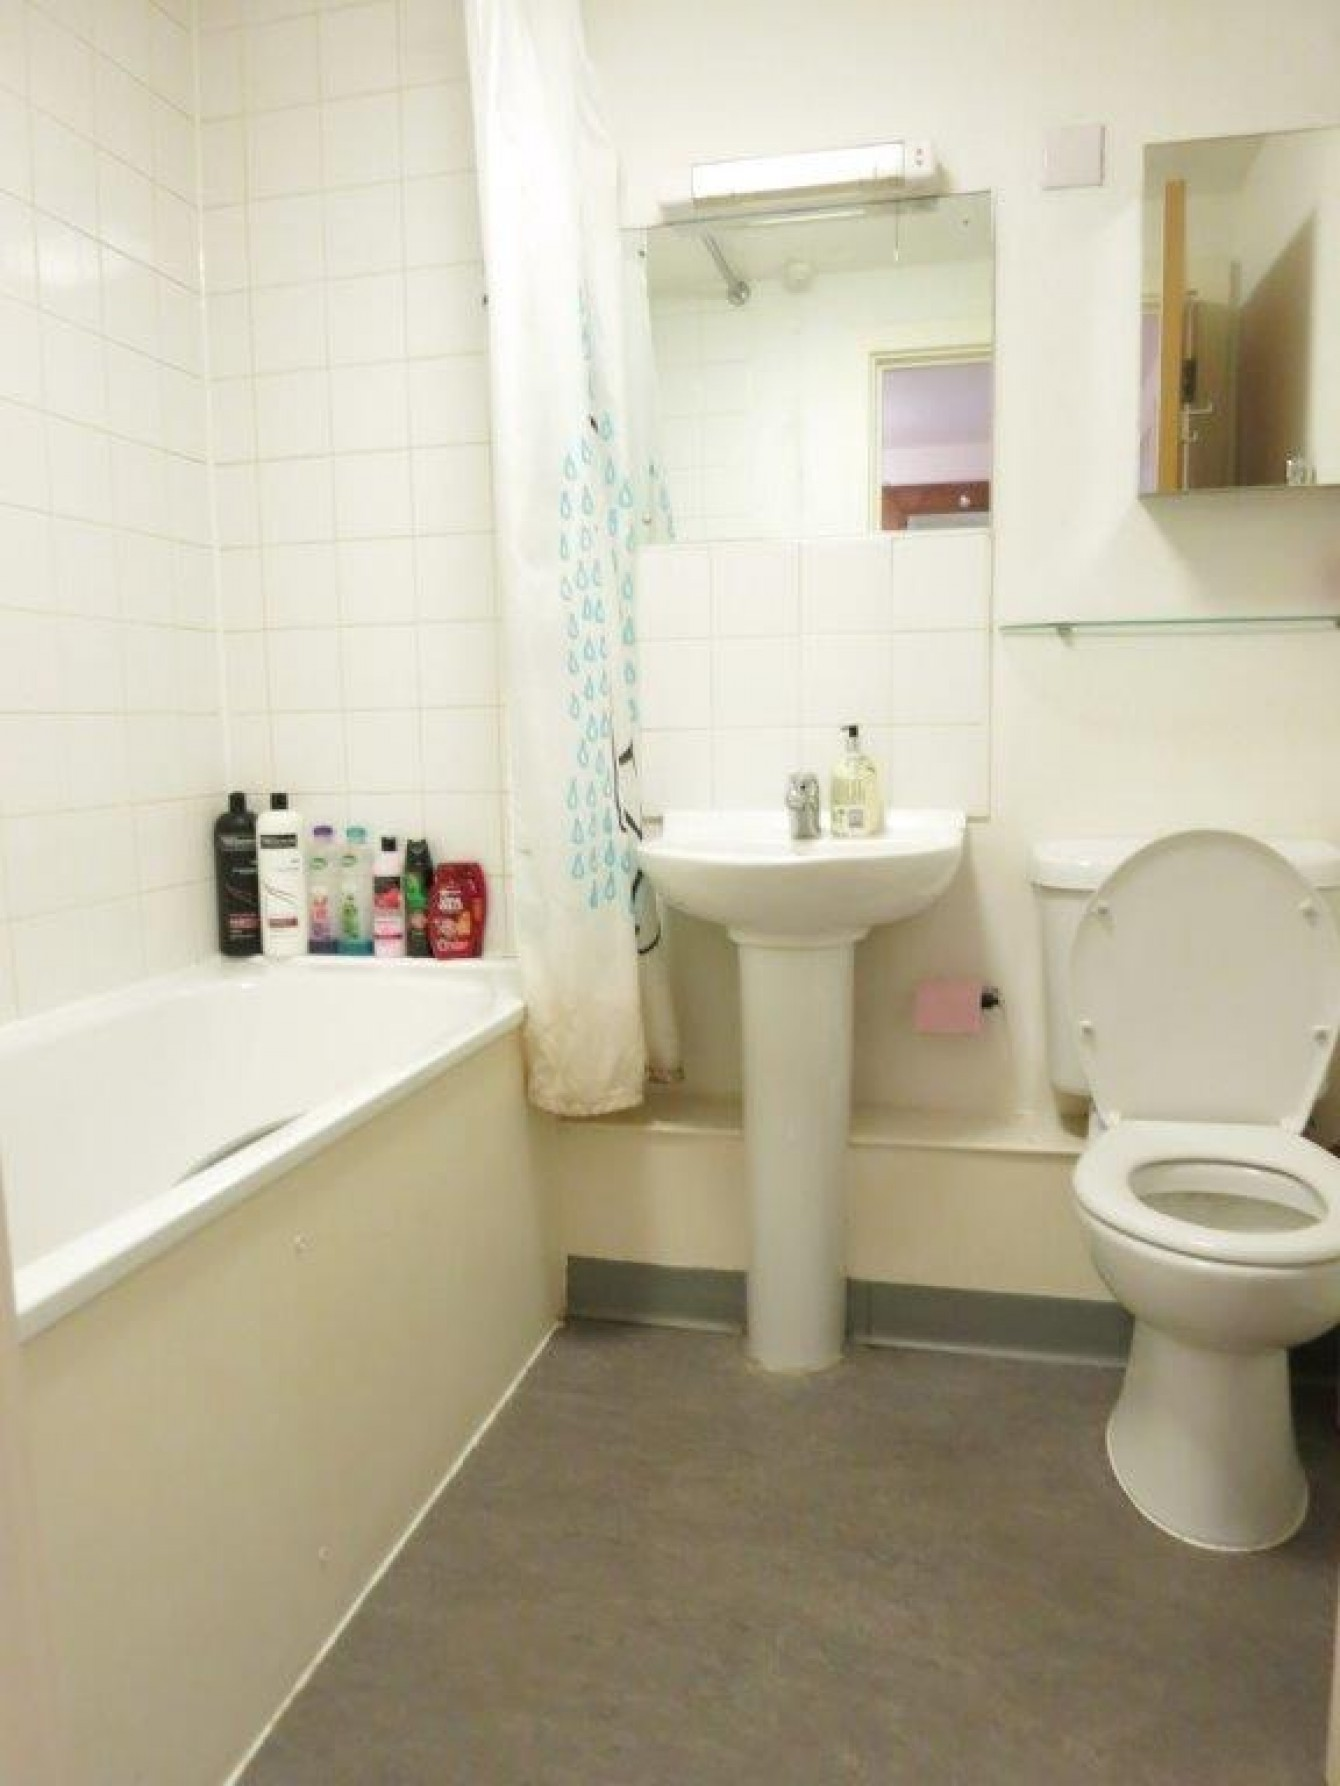 Images for Archway, London EAID:c8d5f0ae42d594d169bca90f3b8b041a BID:1